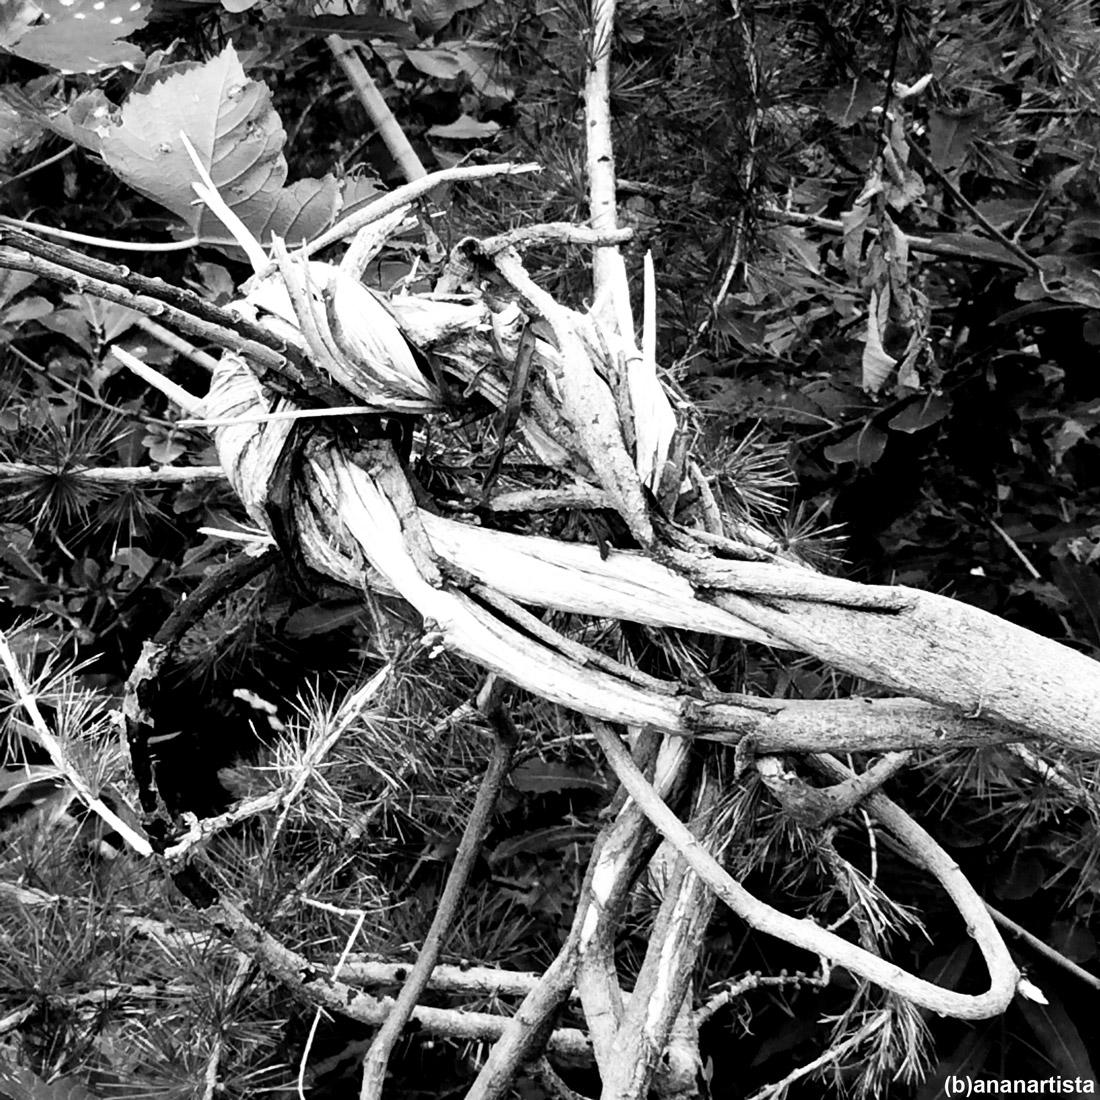 inner union: photography by (b)ananartista sbuff